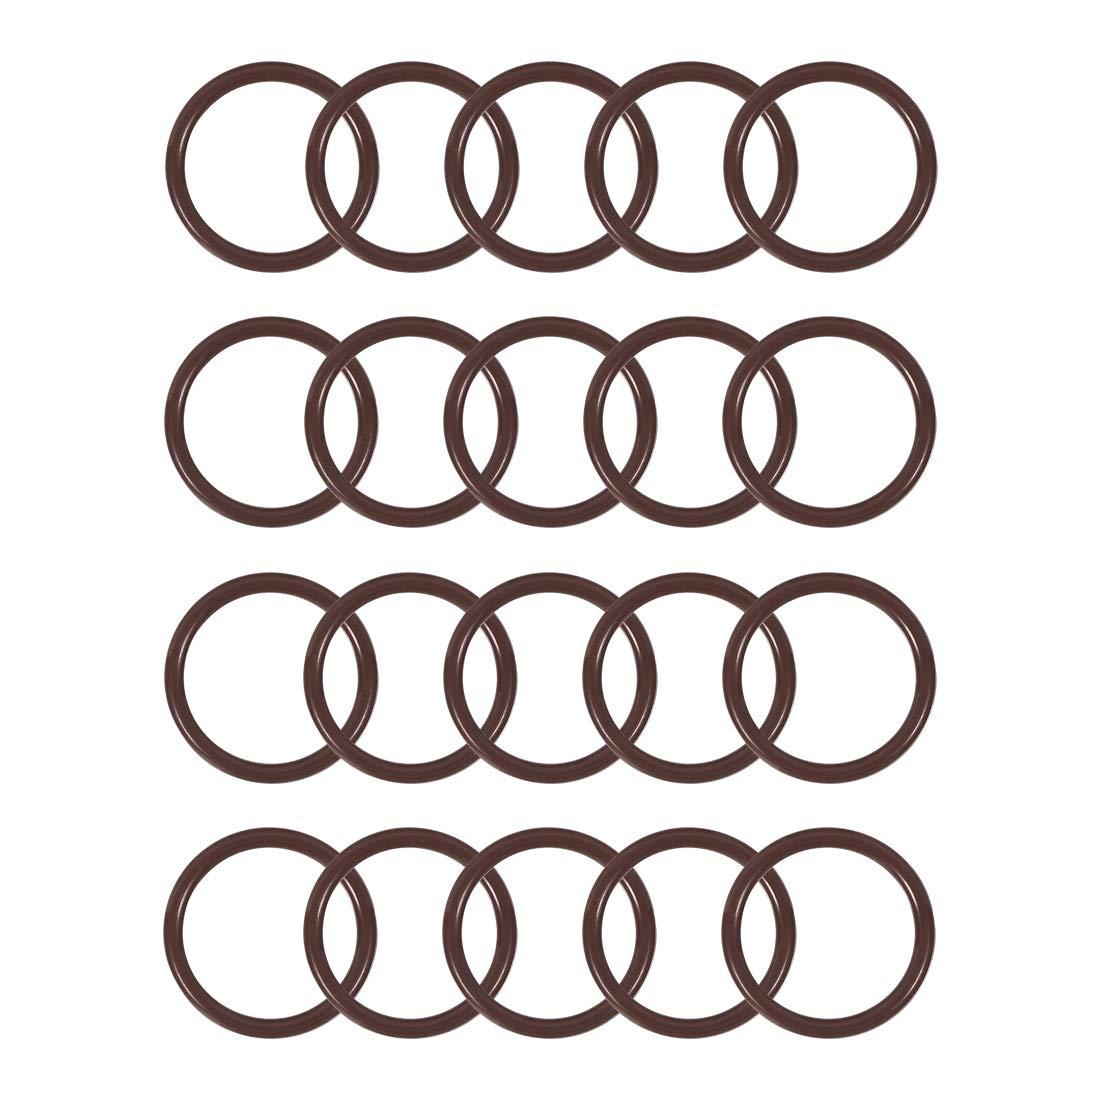 uxcell Fluorine Rubber O-Rings 25mm OD 20mm ID 2.5mm Width FKM Seal Gasket Brown 20pcs